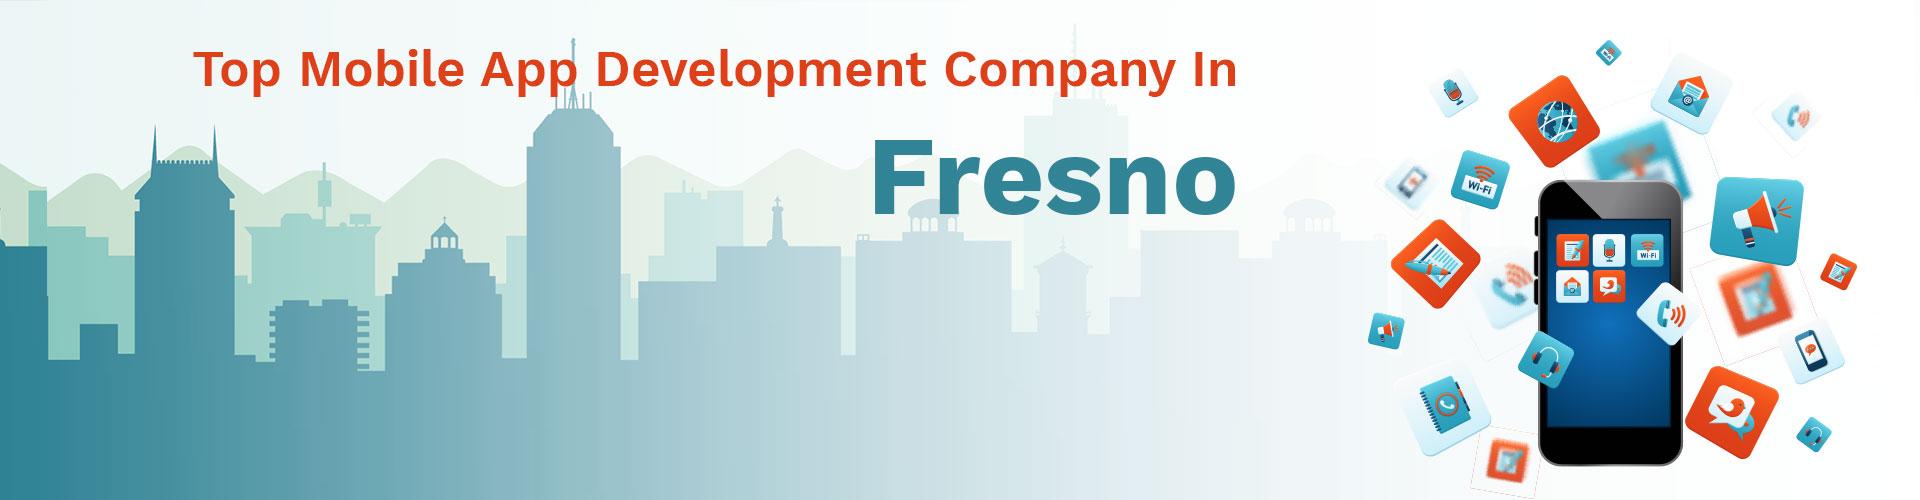 app development company fresno